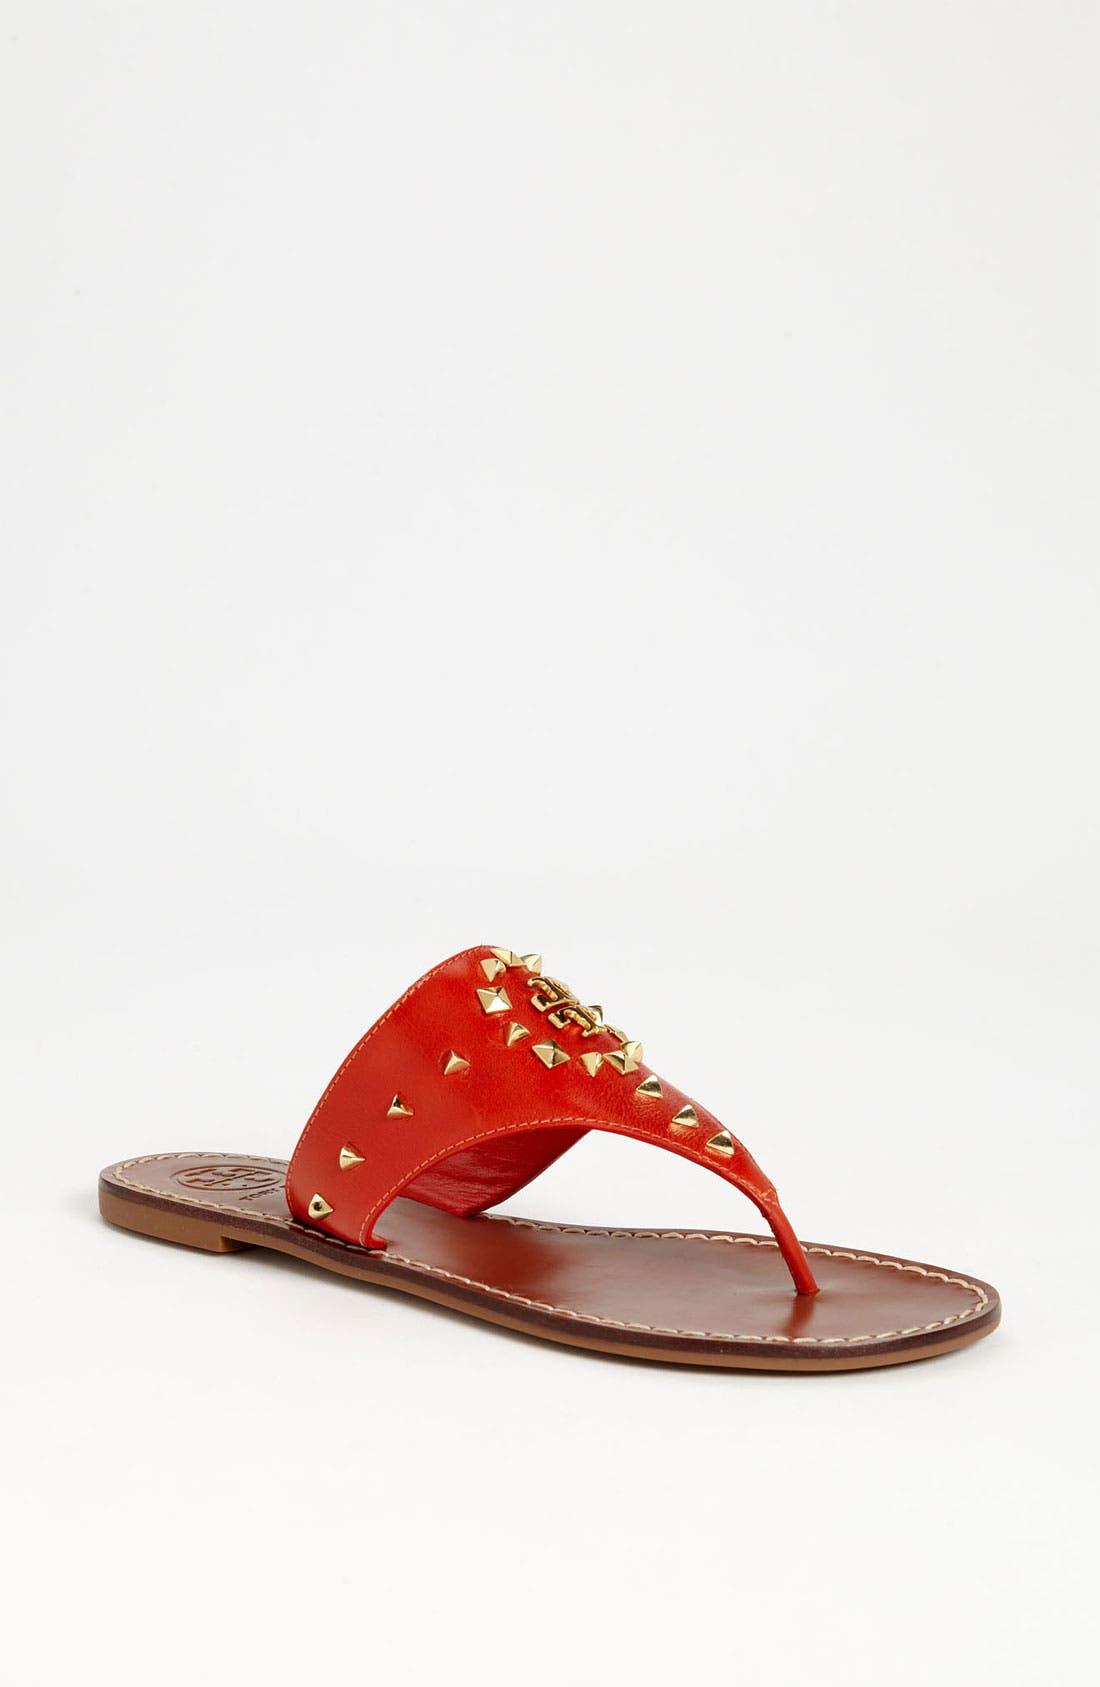 Main Image - Tory Burch 'Dale' Thong Sandal